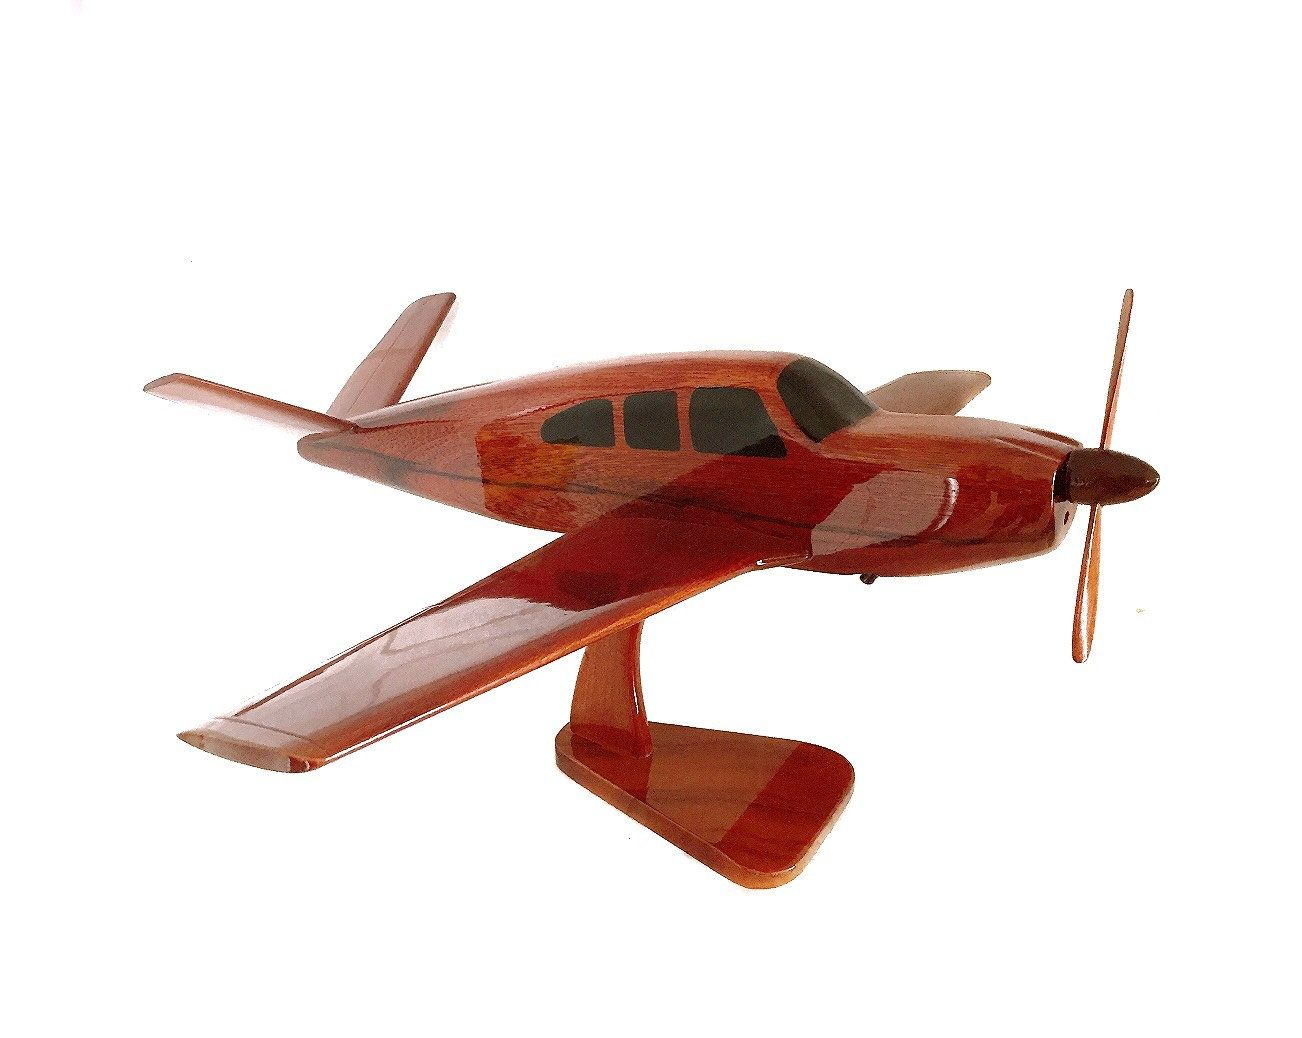 Civil Utility Aircraft Beechcraft Bonanza Bonanza V Tail Etsy In 2020 Aircraft General Aviation Civilization